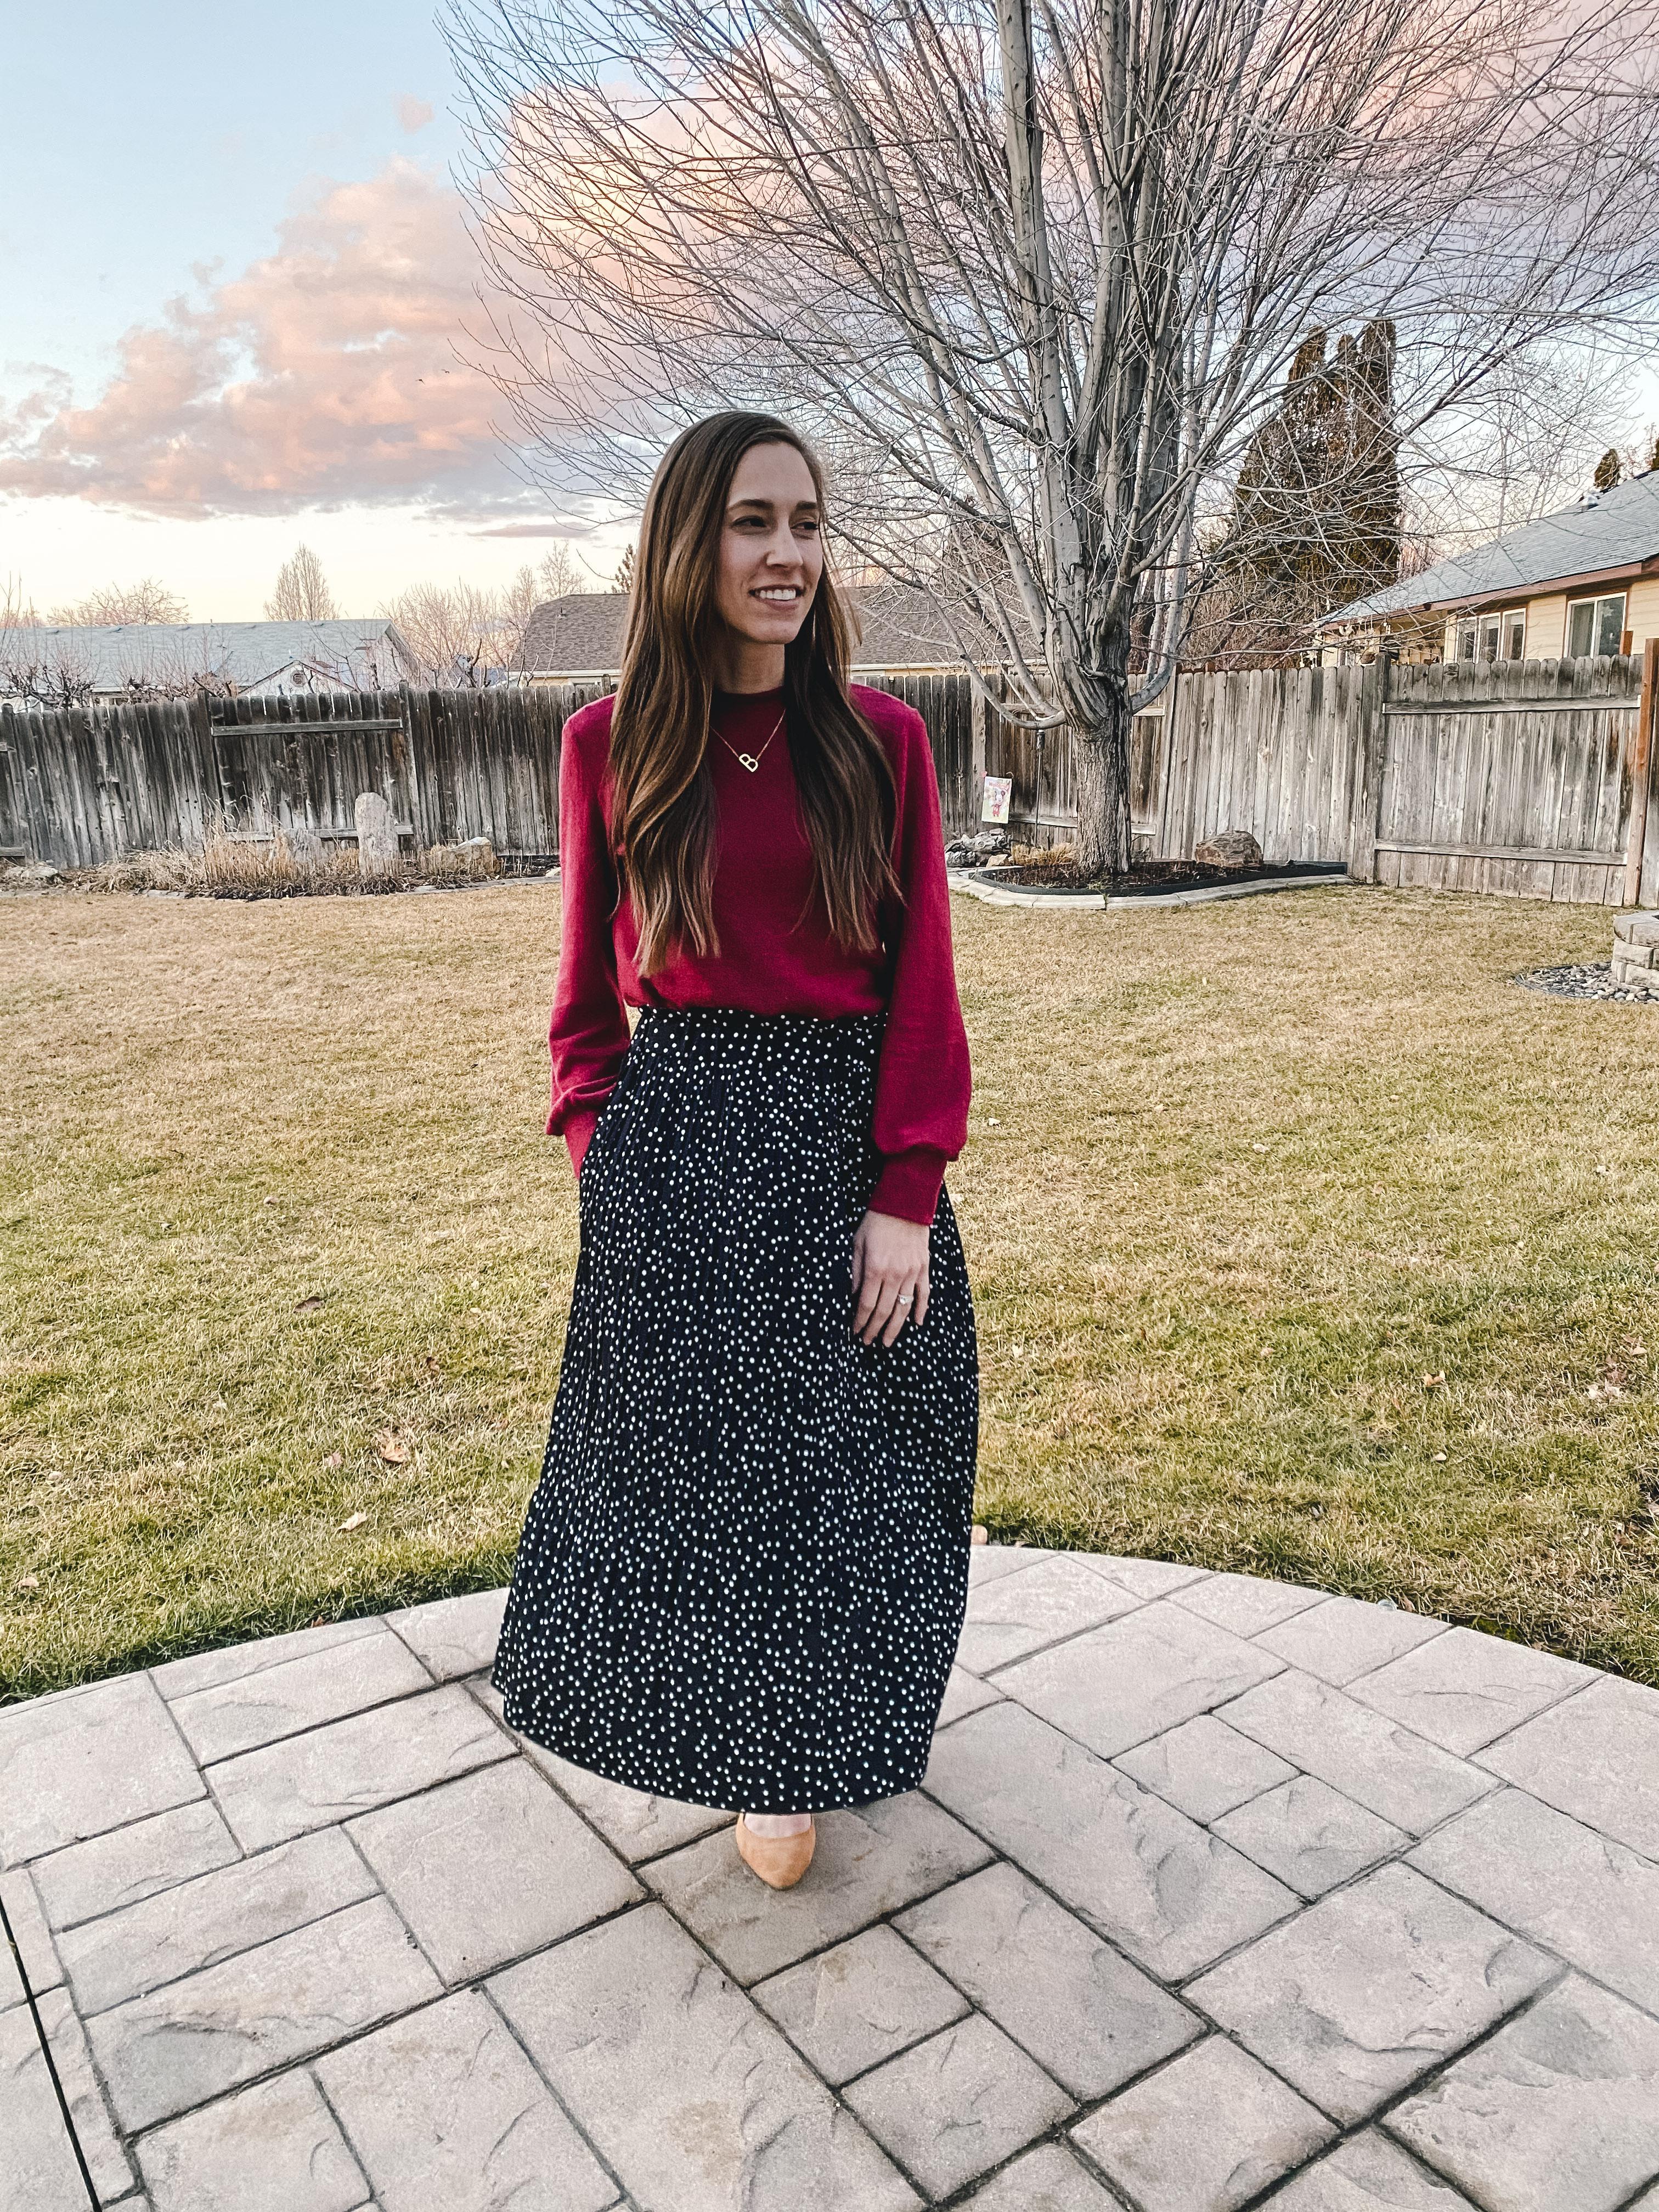 diy clothing, make your own shirt, shirt pattern, long sleeve blouse pattern, make your own pattern, britt stitch patterns,